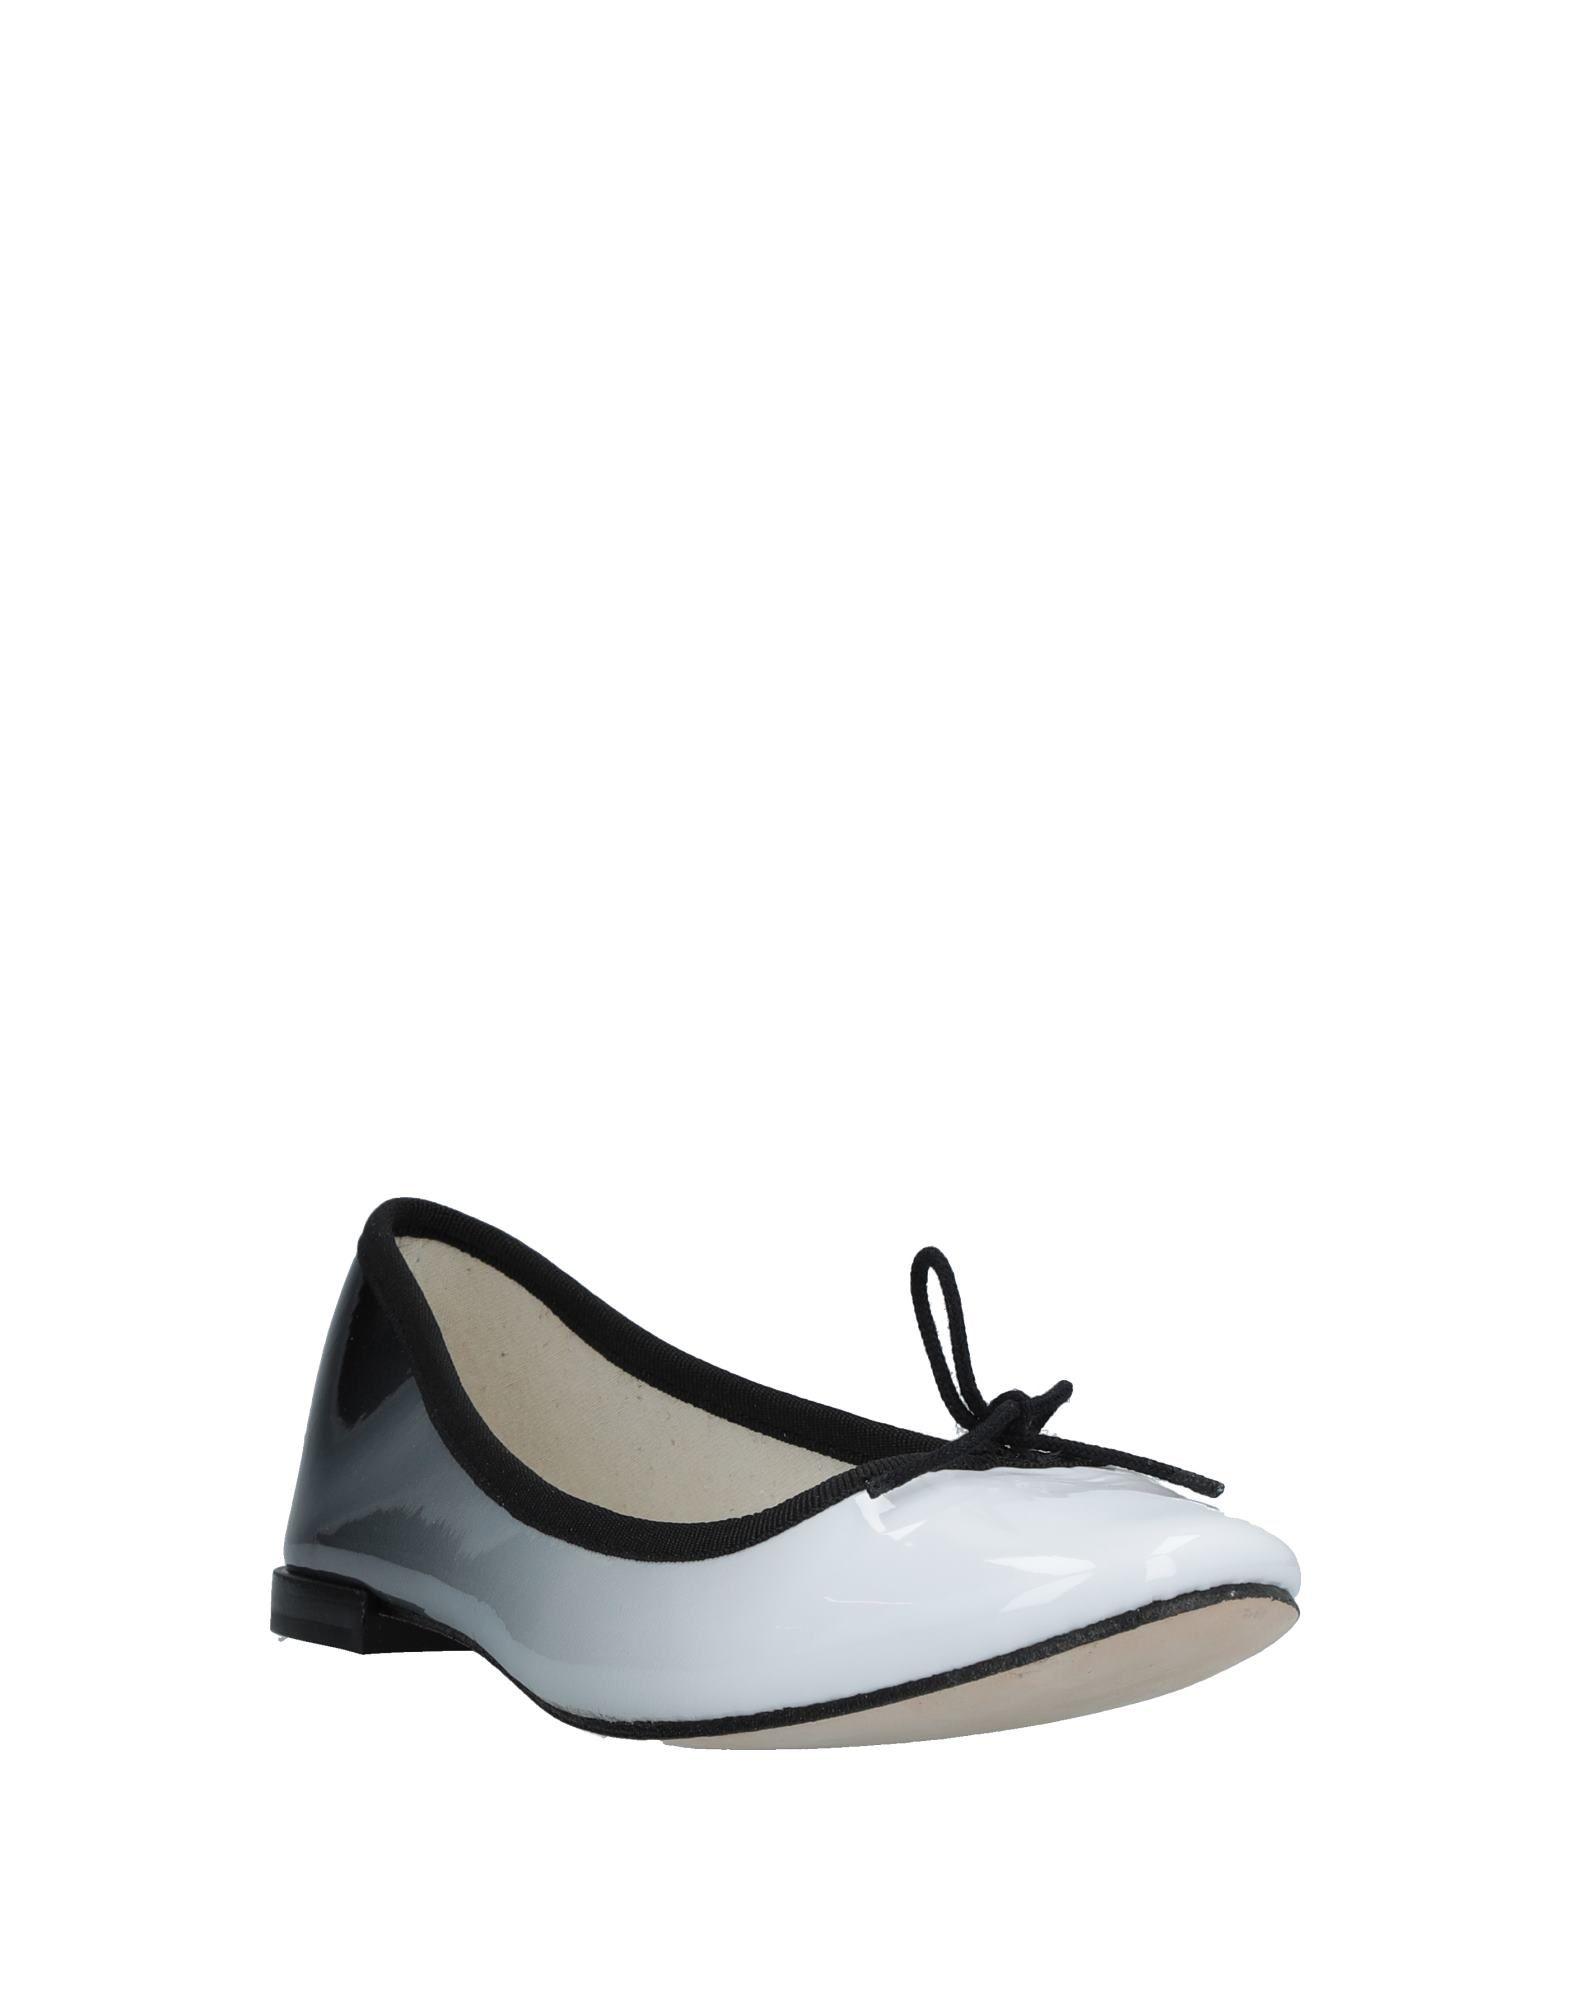 Stilvolle billige Schuhe Repetto Ballerinas Damen  11534795OF 11534795OF 11534795OF ed85bb